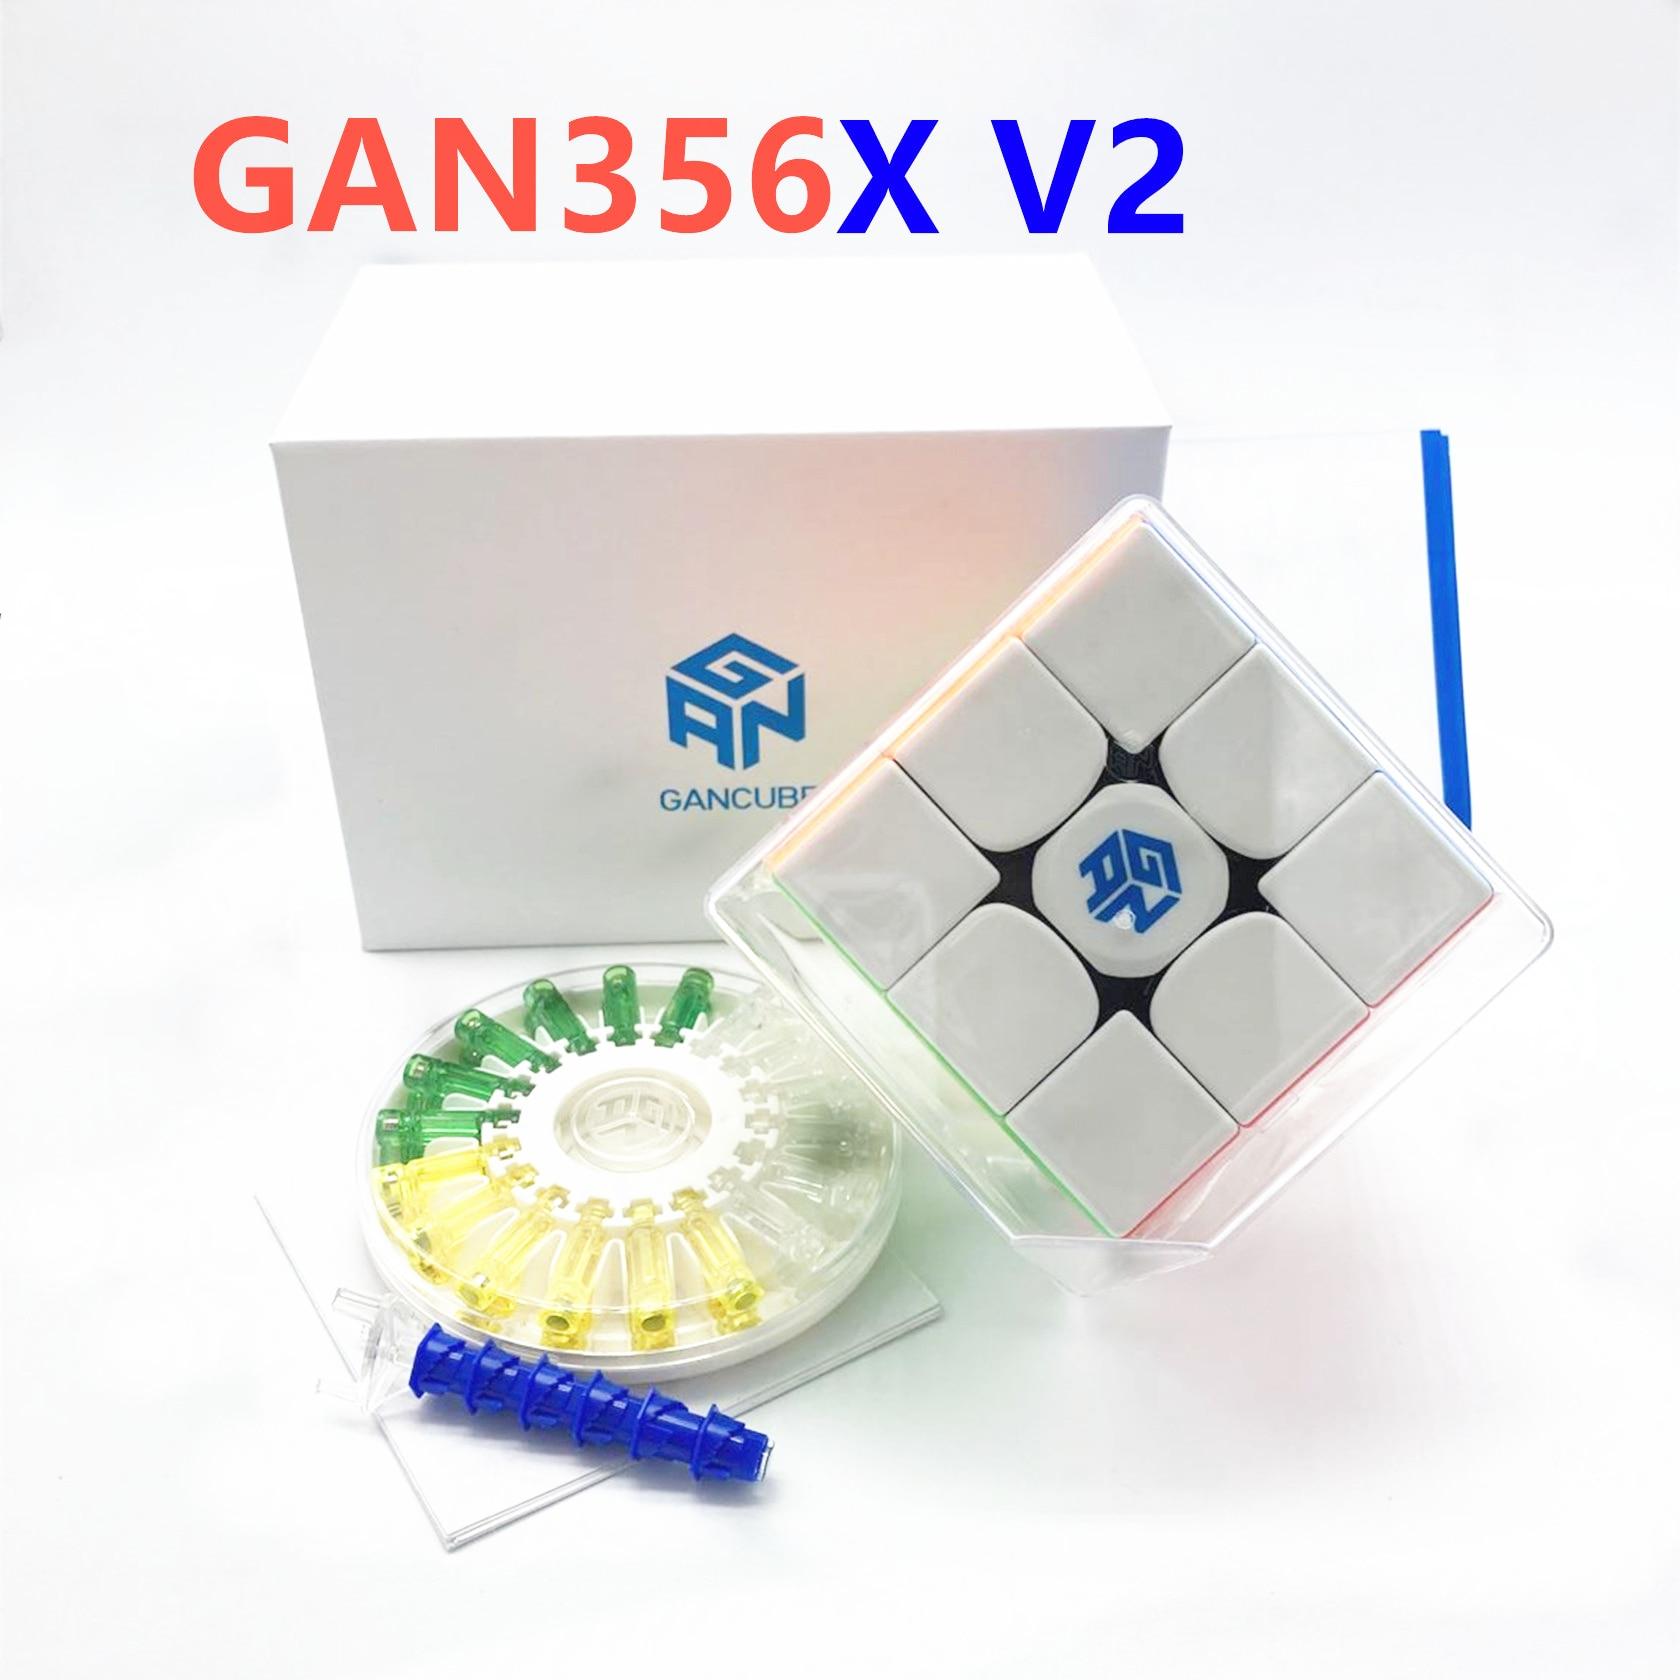 GAN356X V2 3x3x3 cube GAN356 X V2 3x3 Magnetic Speed cube Magic gan356 X V2 GAN 356 X V2 Puzzle magnet Cube for adults kids Toys